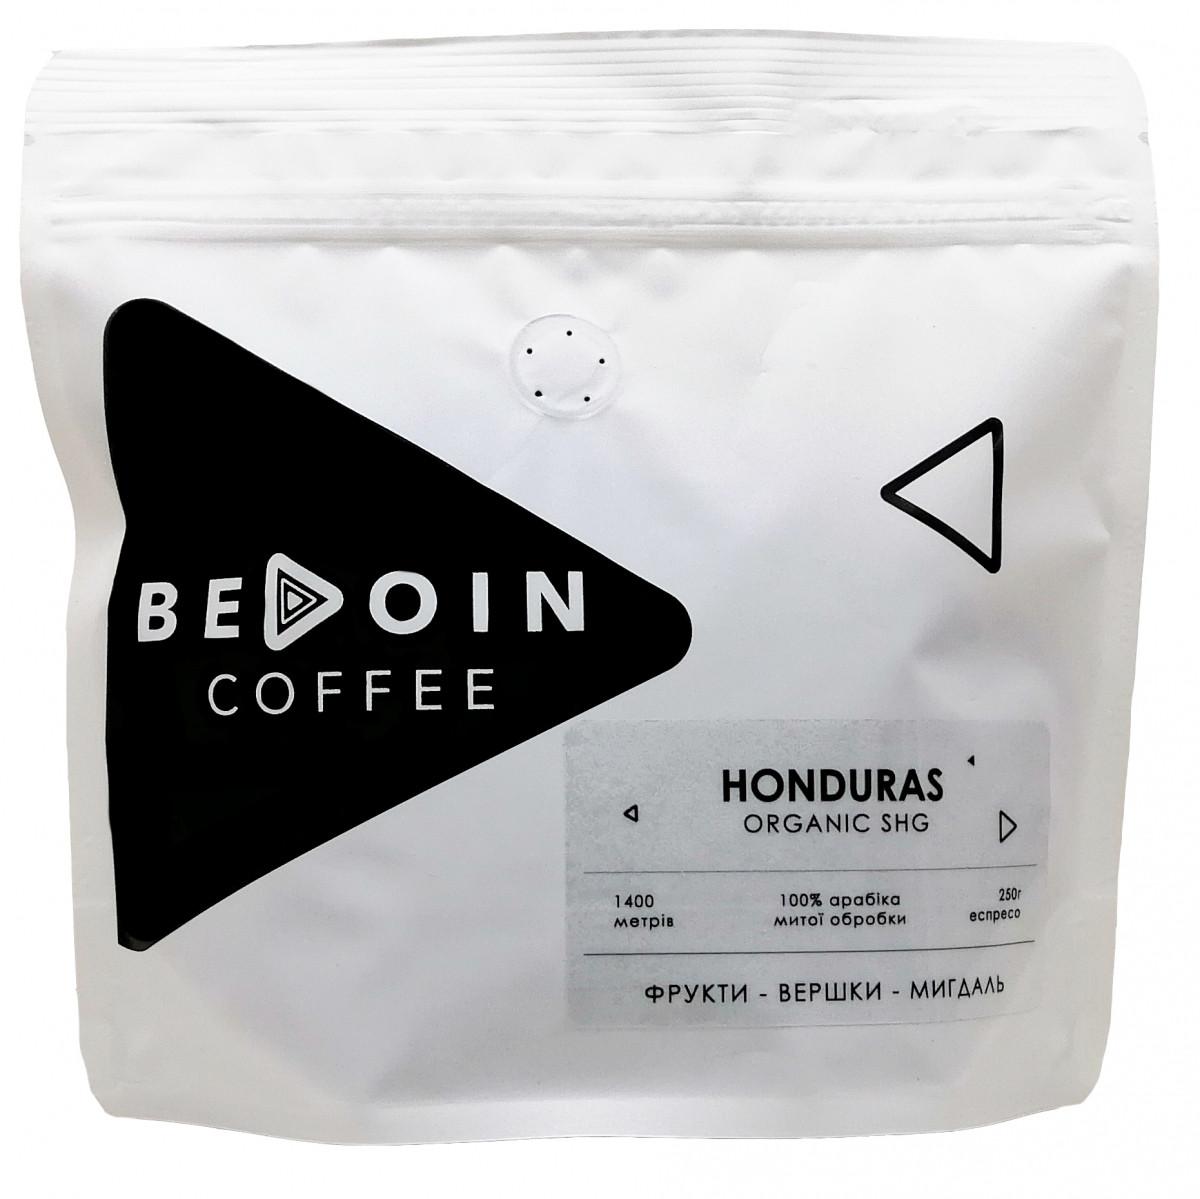 Кофе свежая обжарка HONDURAS SHG CAUFUL CO-OP, ORGANIC 250Г